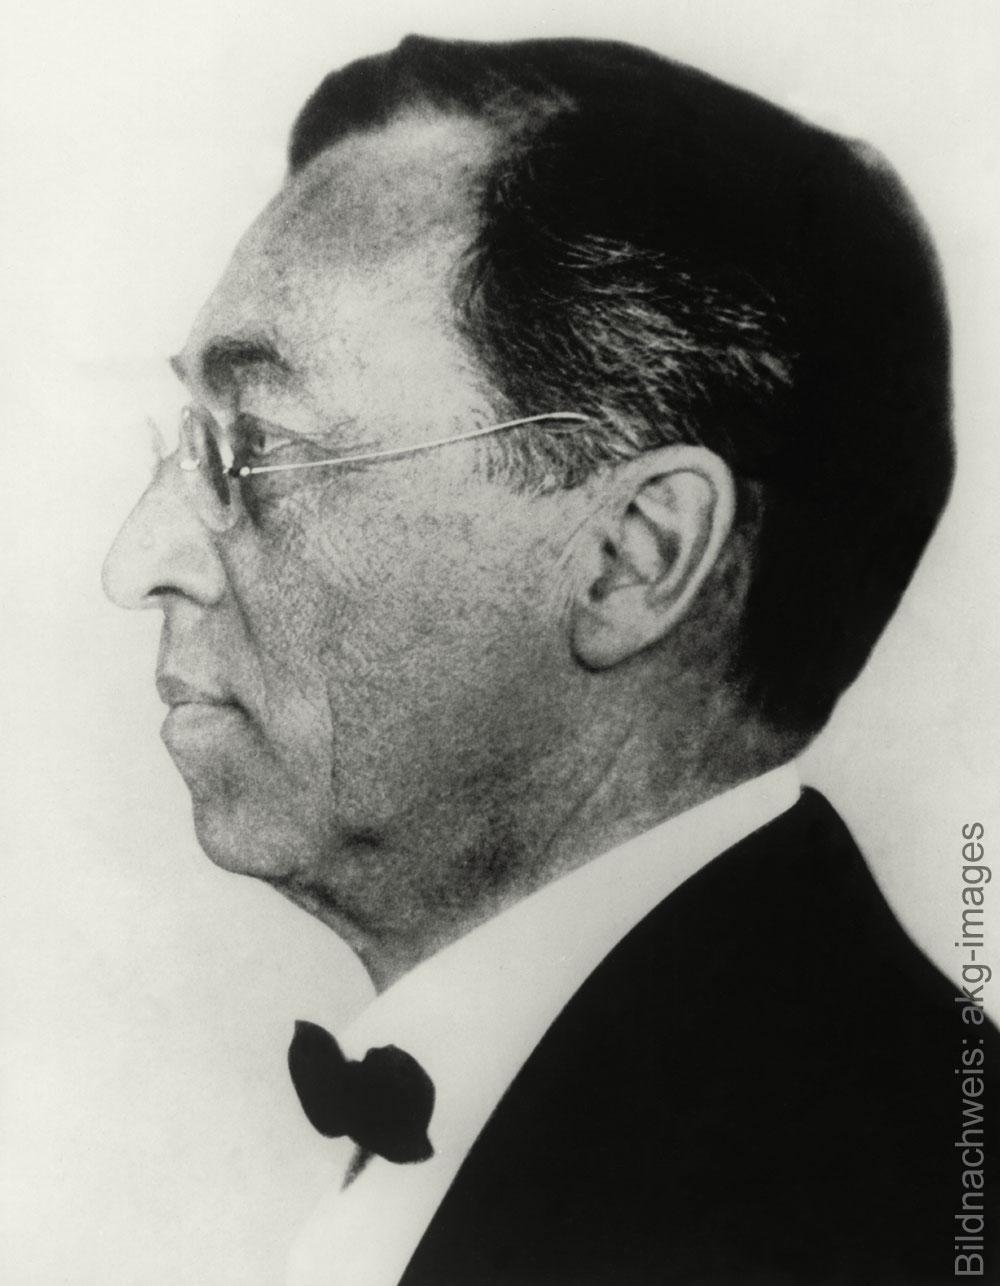 Porträt des Künstlers wassily Kandinsky